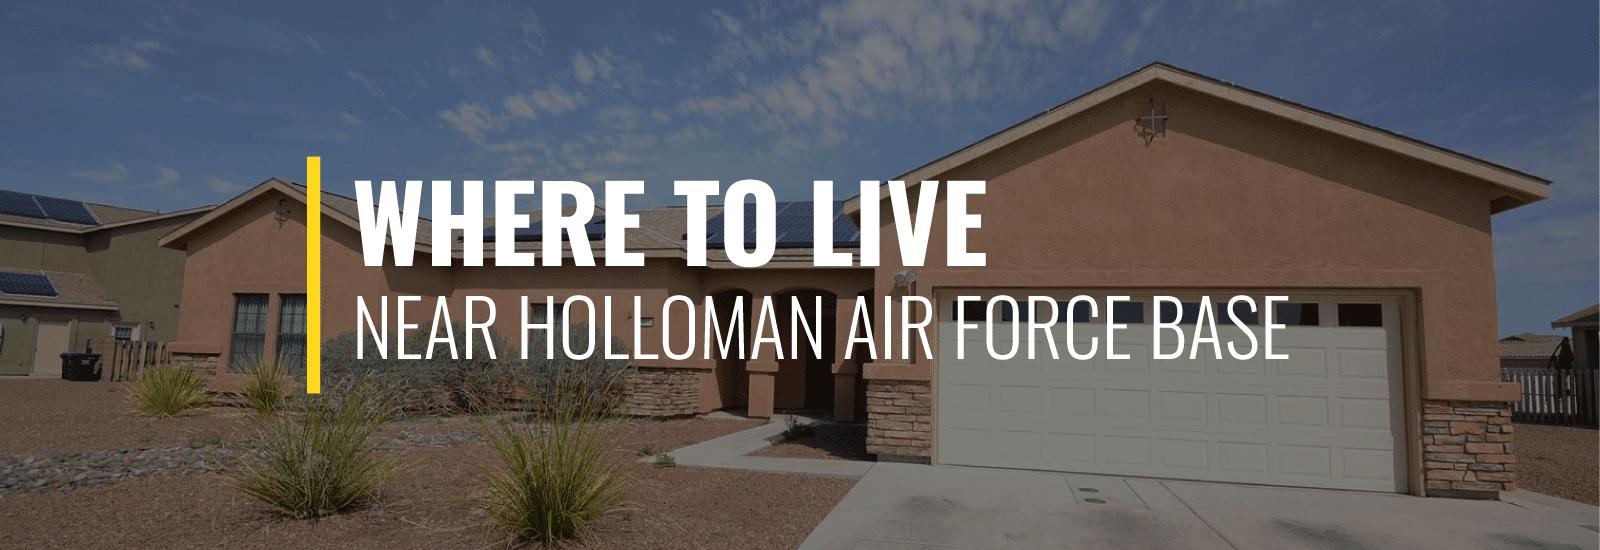 Where Should I Live Near Holloman Air Force Base?